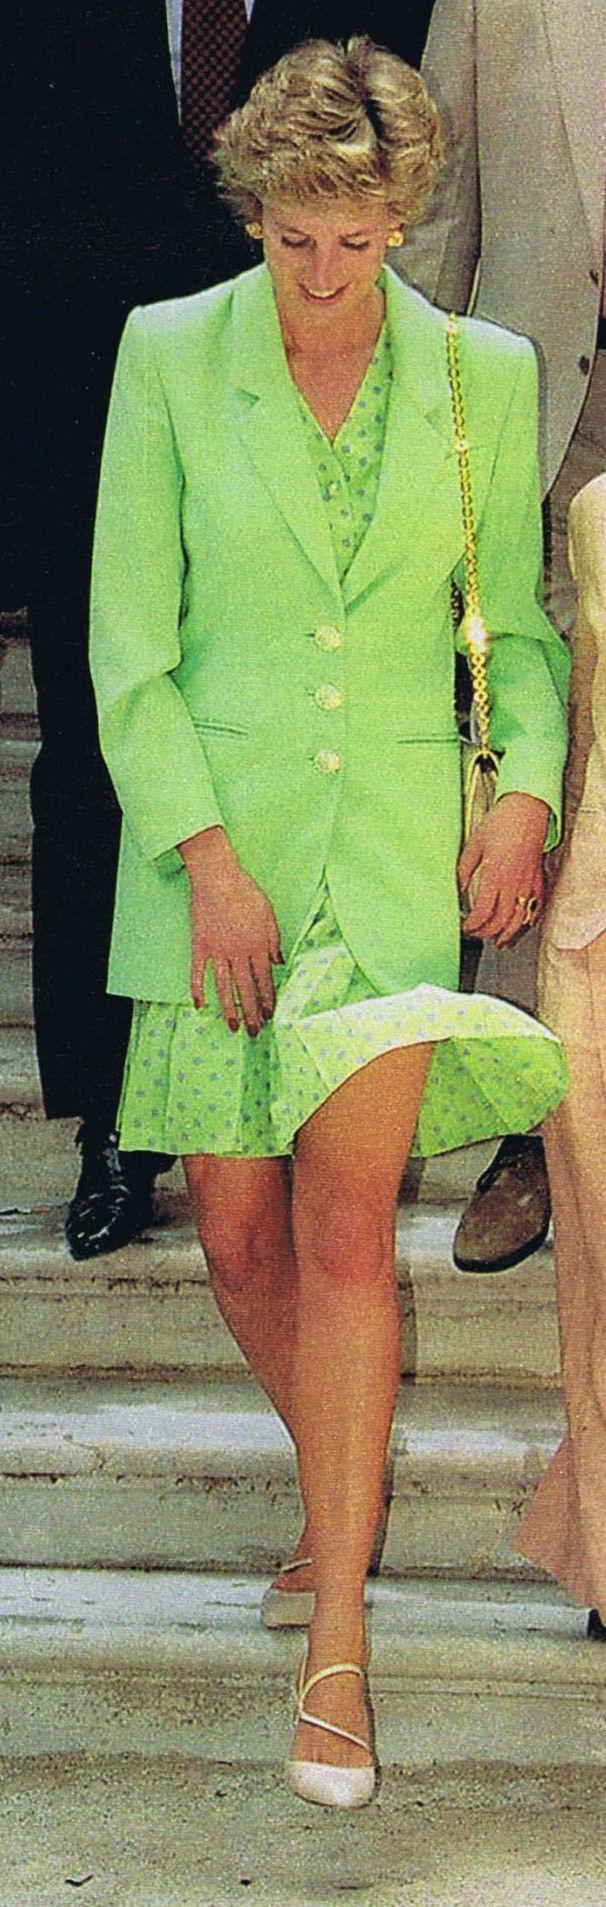 Diana princess of wales upskirt